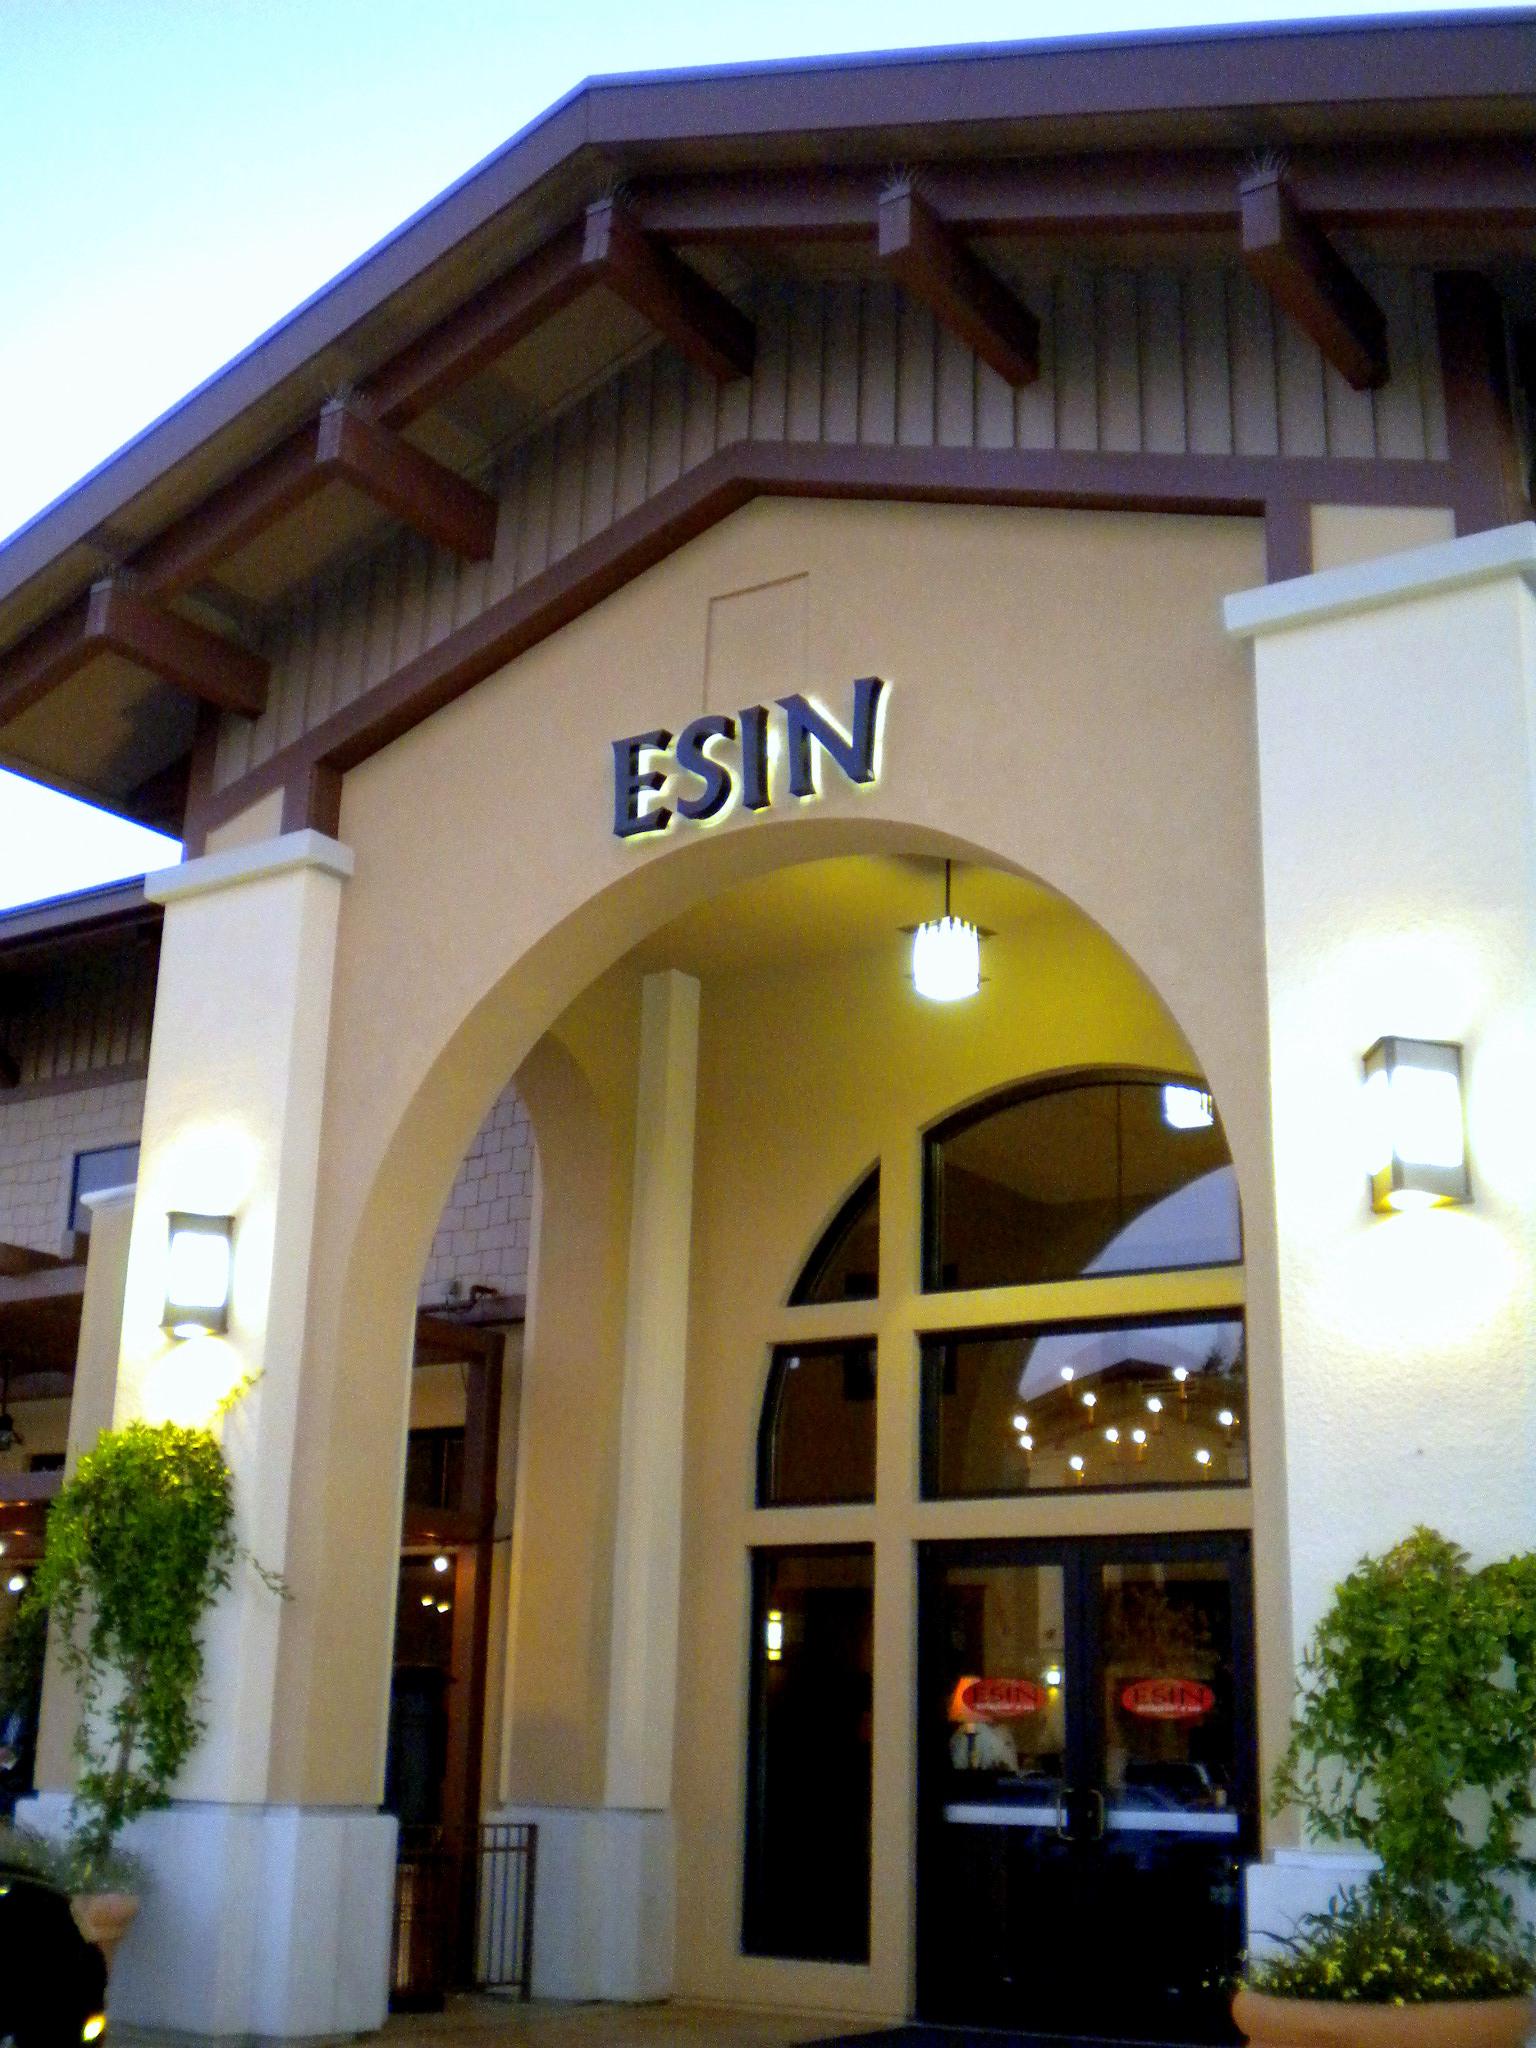 20090821-Esin 09